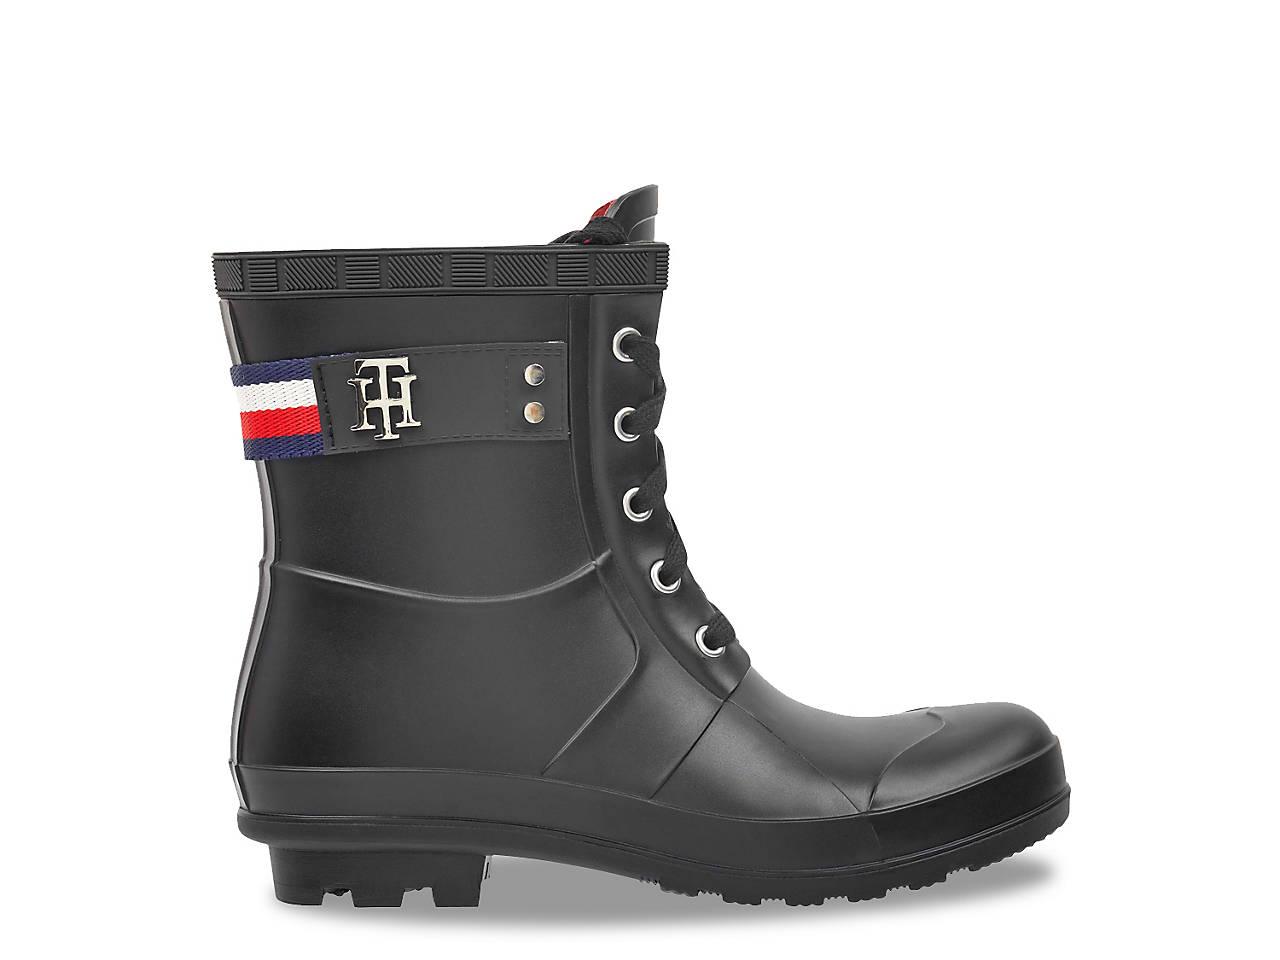 d3b95a0d2f0d8 Tommy Hilfiger Toniee Rain Boot Women s Shoes